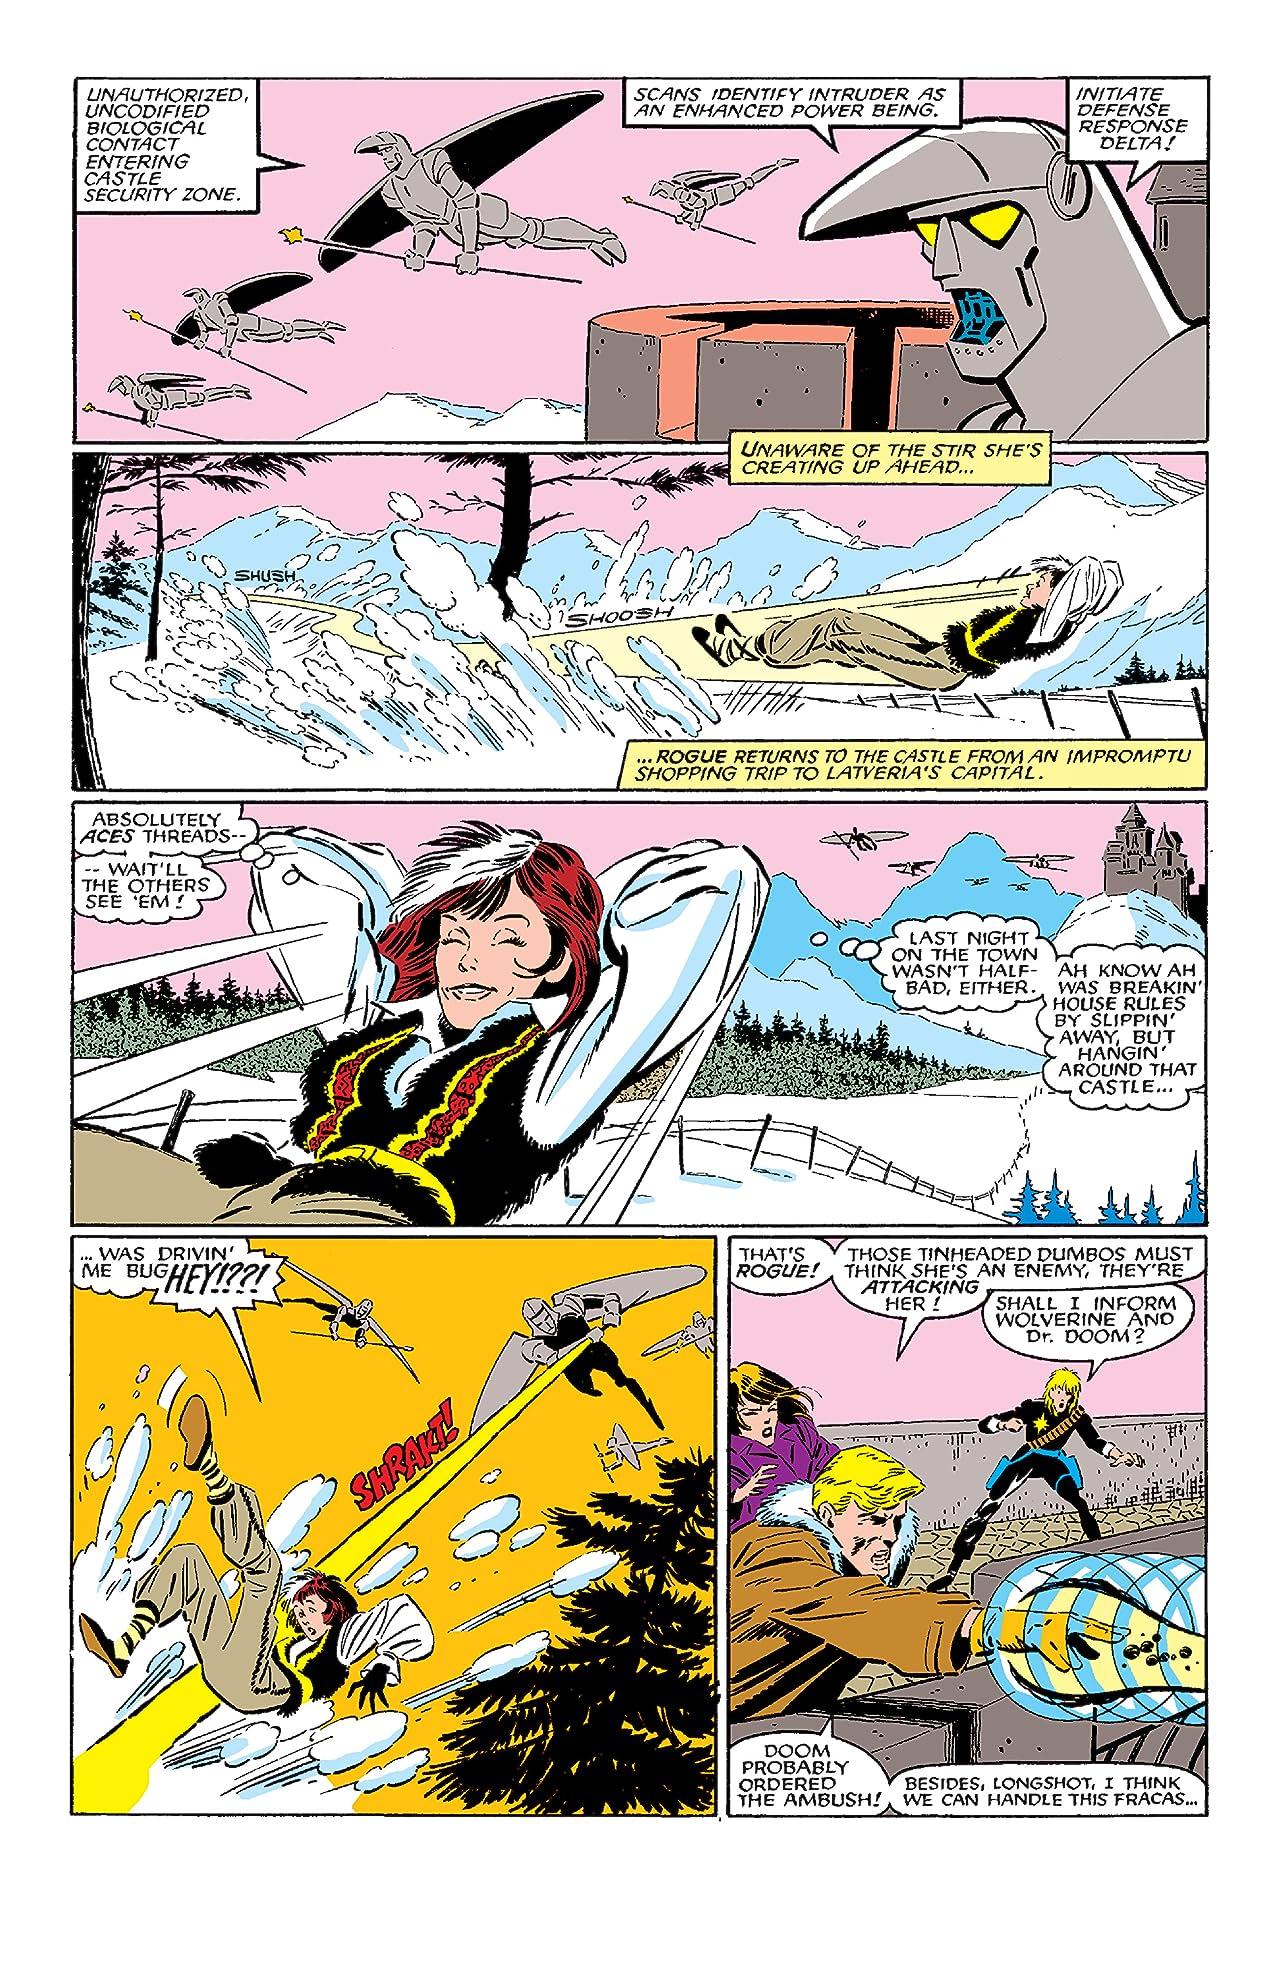 Fantastic Four vs. X-Men (1987) #3 (of 4)